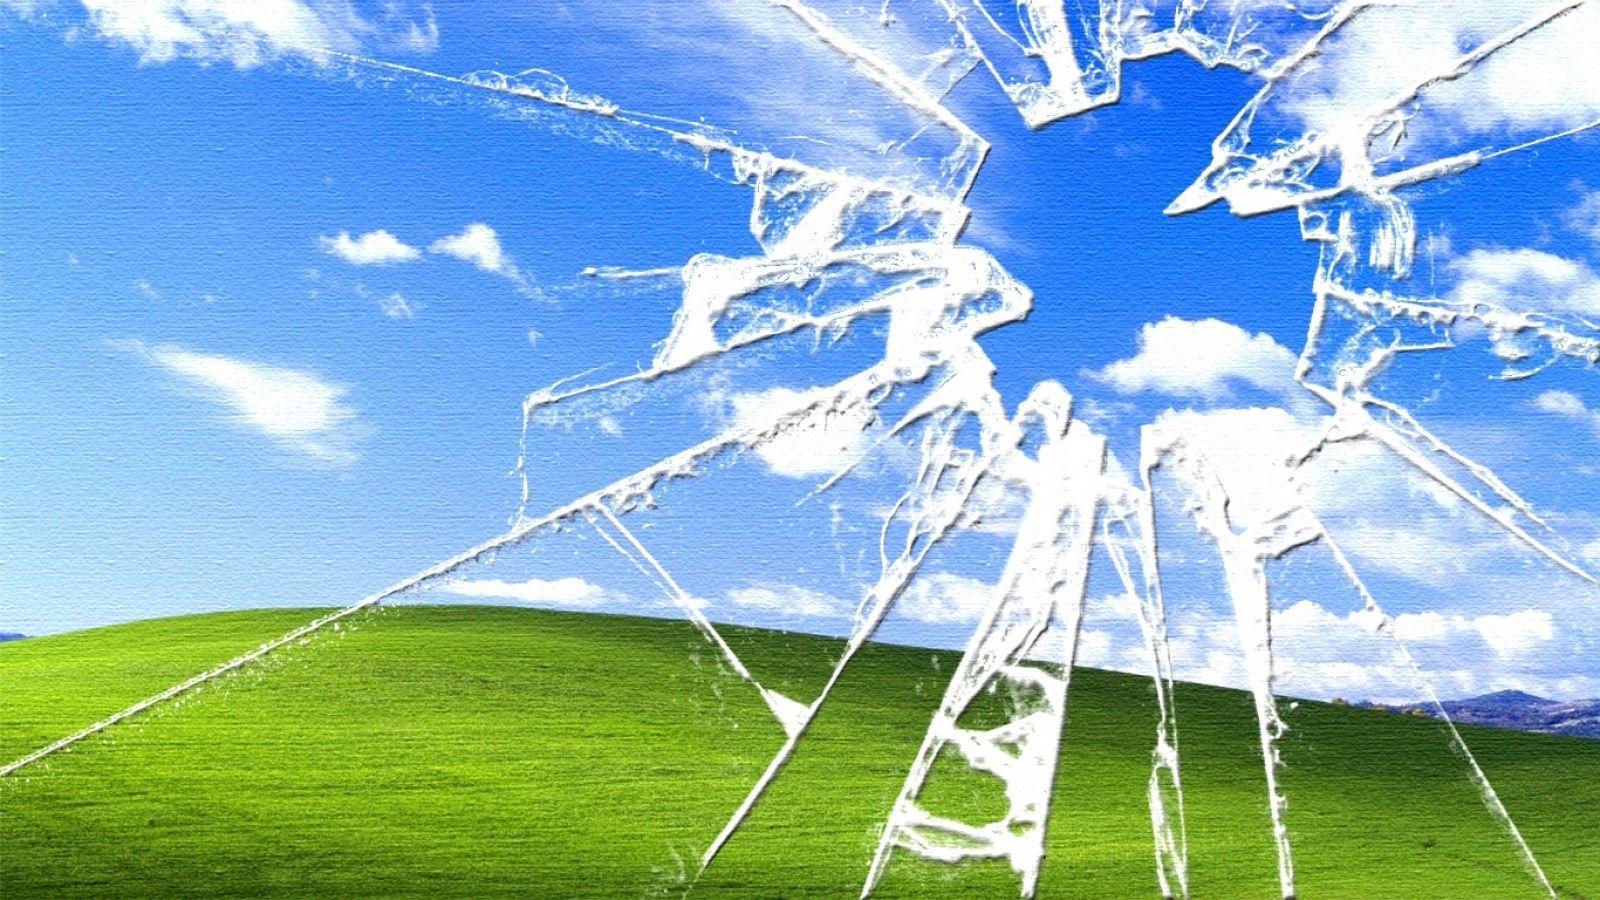 Windows XP wallpapers HD for desktop backgrounds